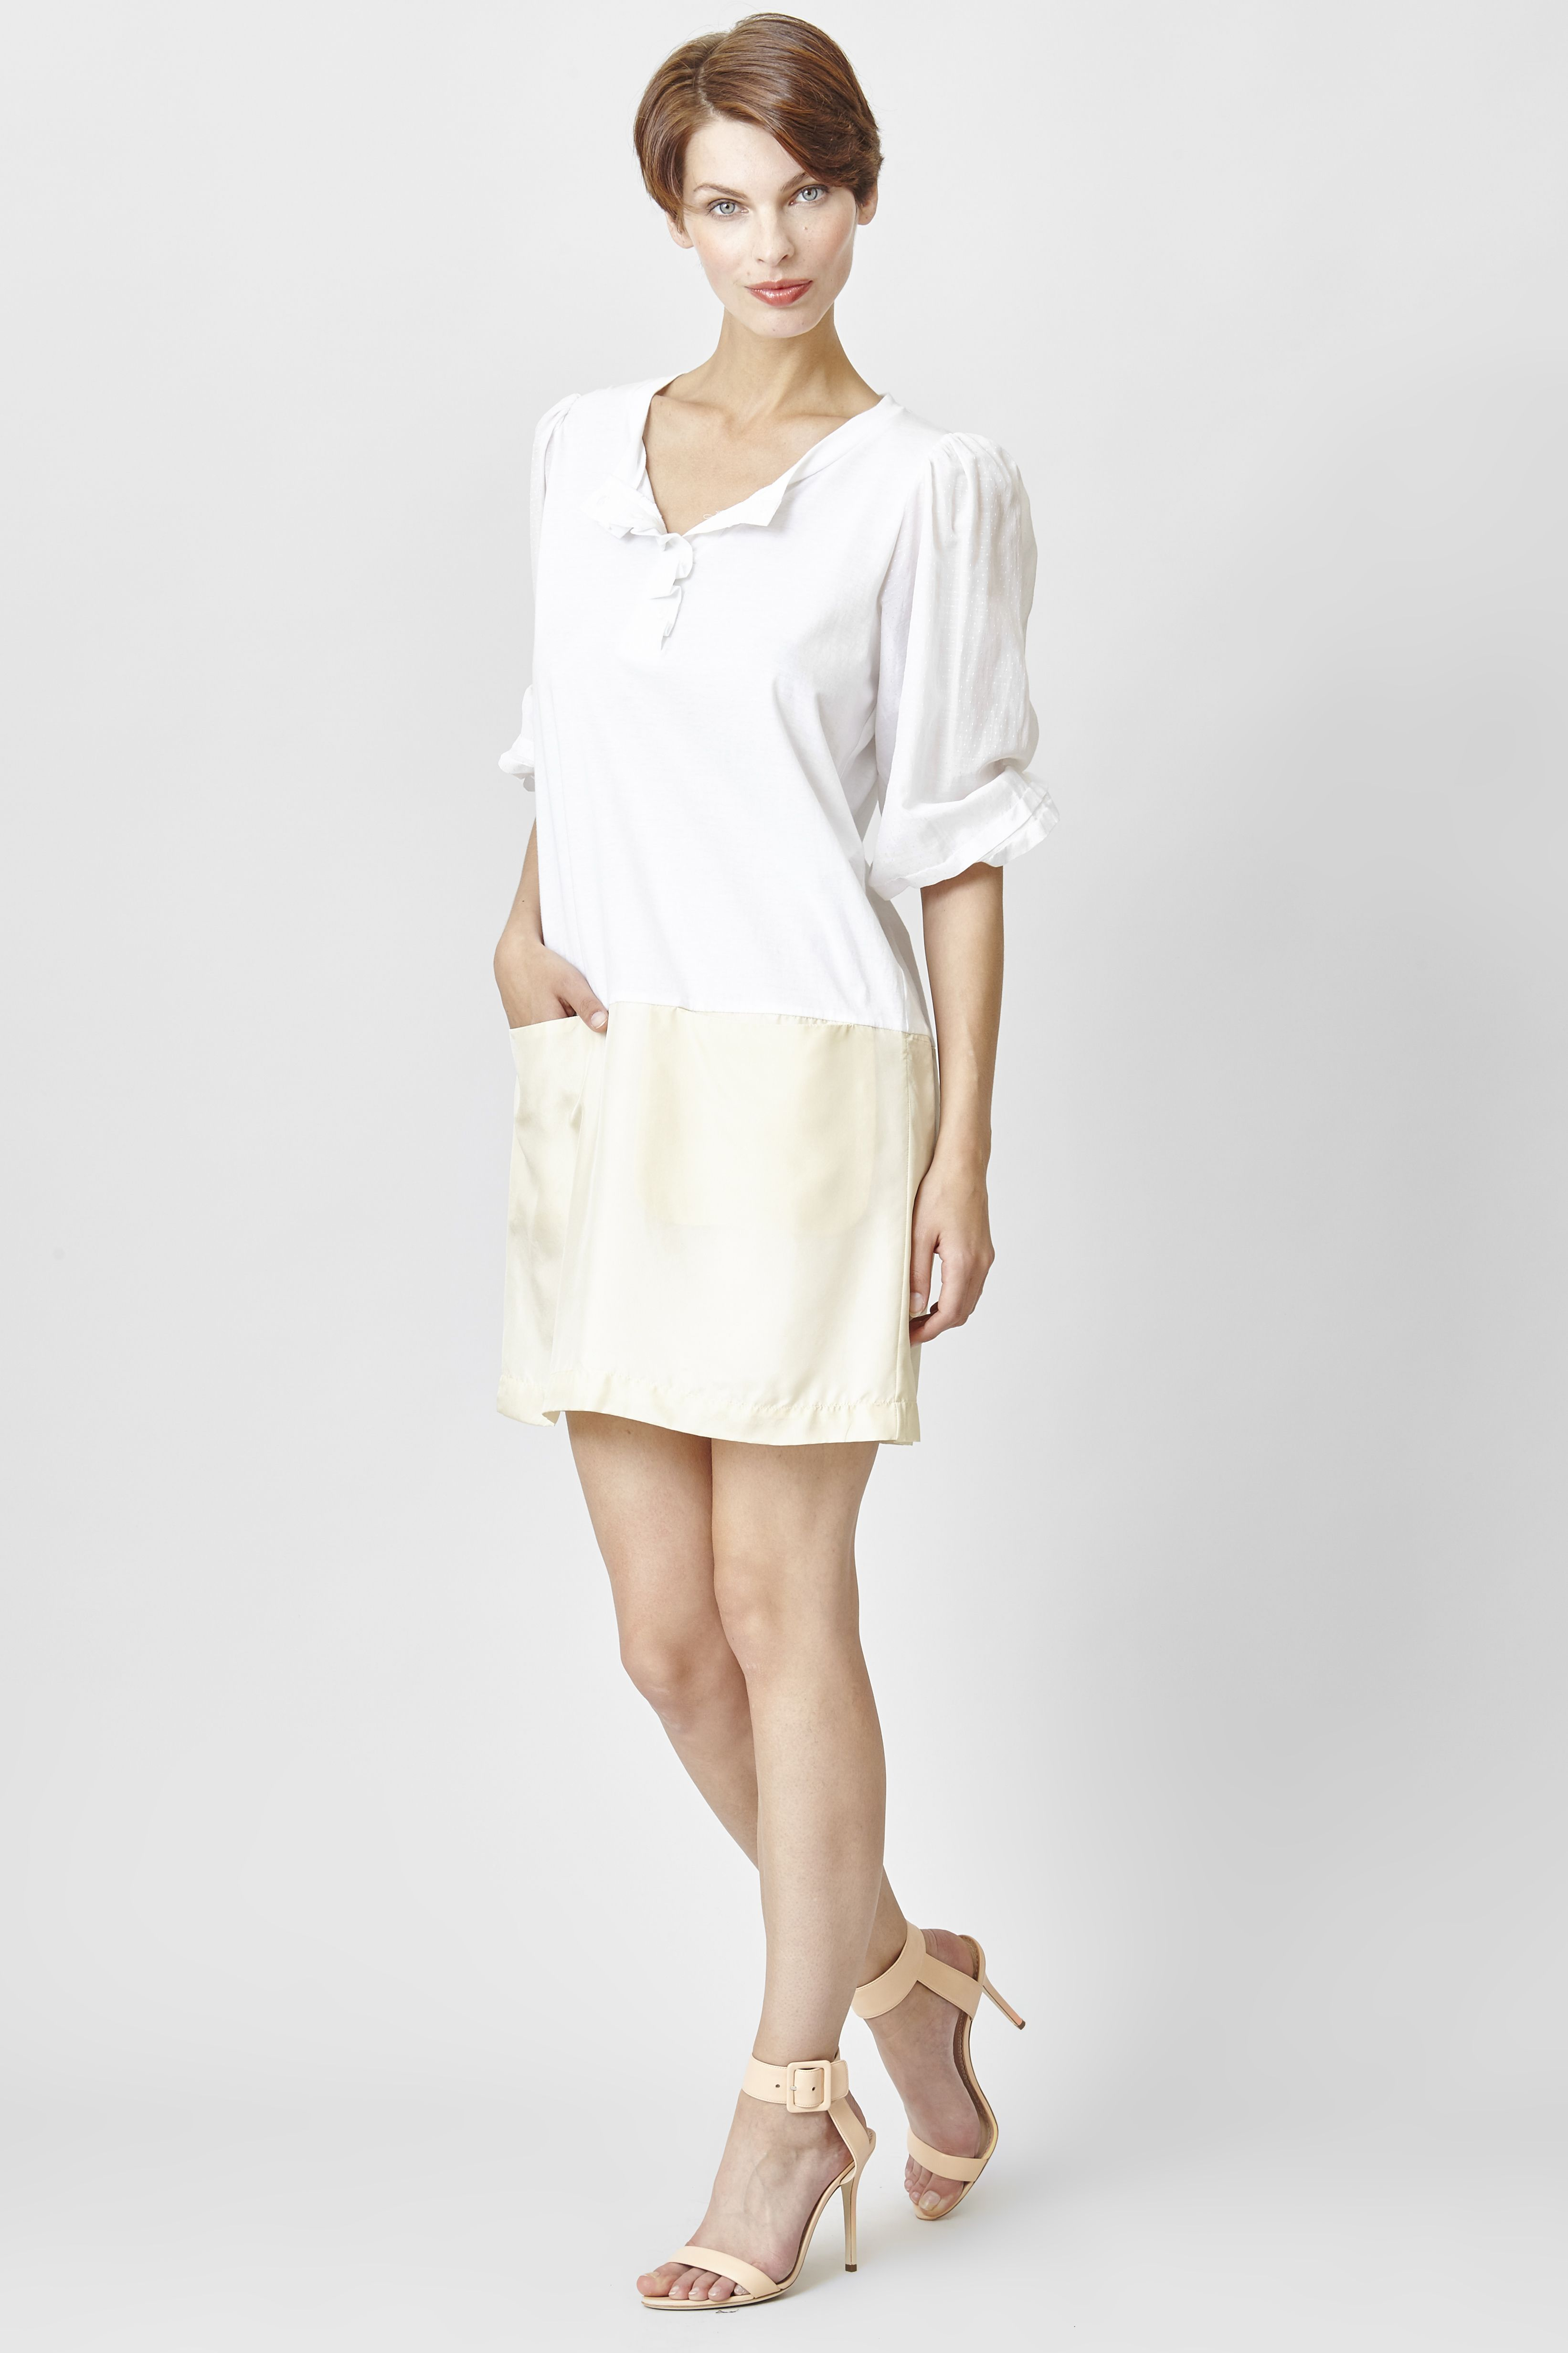 bdf339ef9aee8 C est Ma Robe - Dresshire - See by Chloé - Location robes de luxe ...